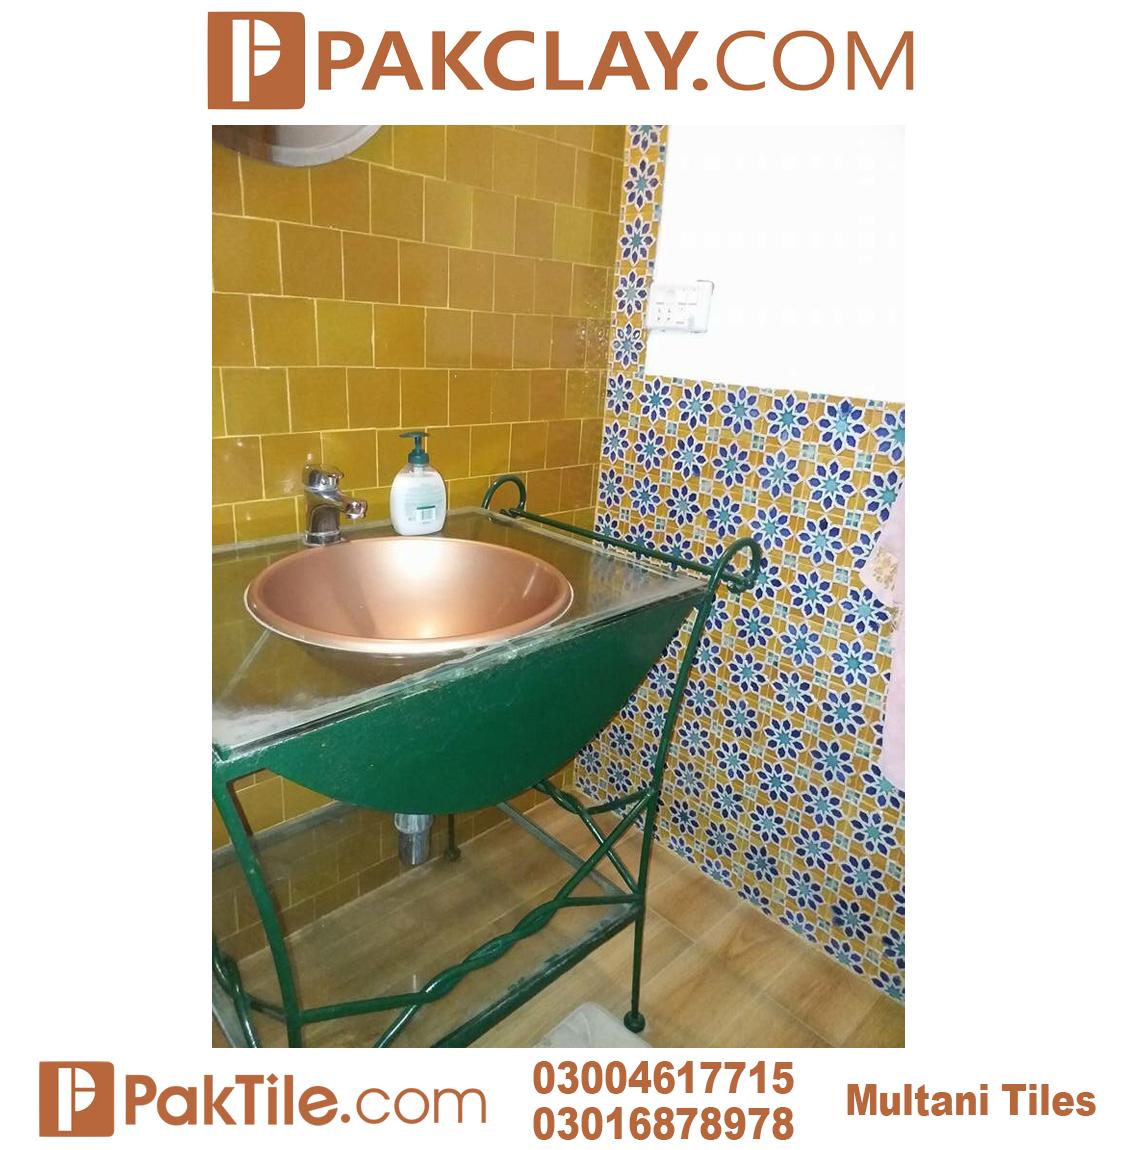 14 Pak Clay Handmade Tiles Pakistan Ceramic Mosaic Wall Tiles